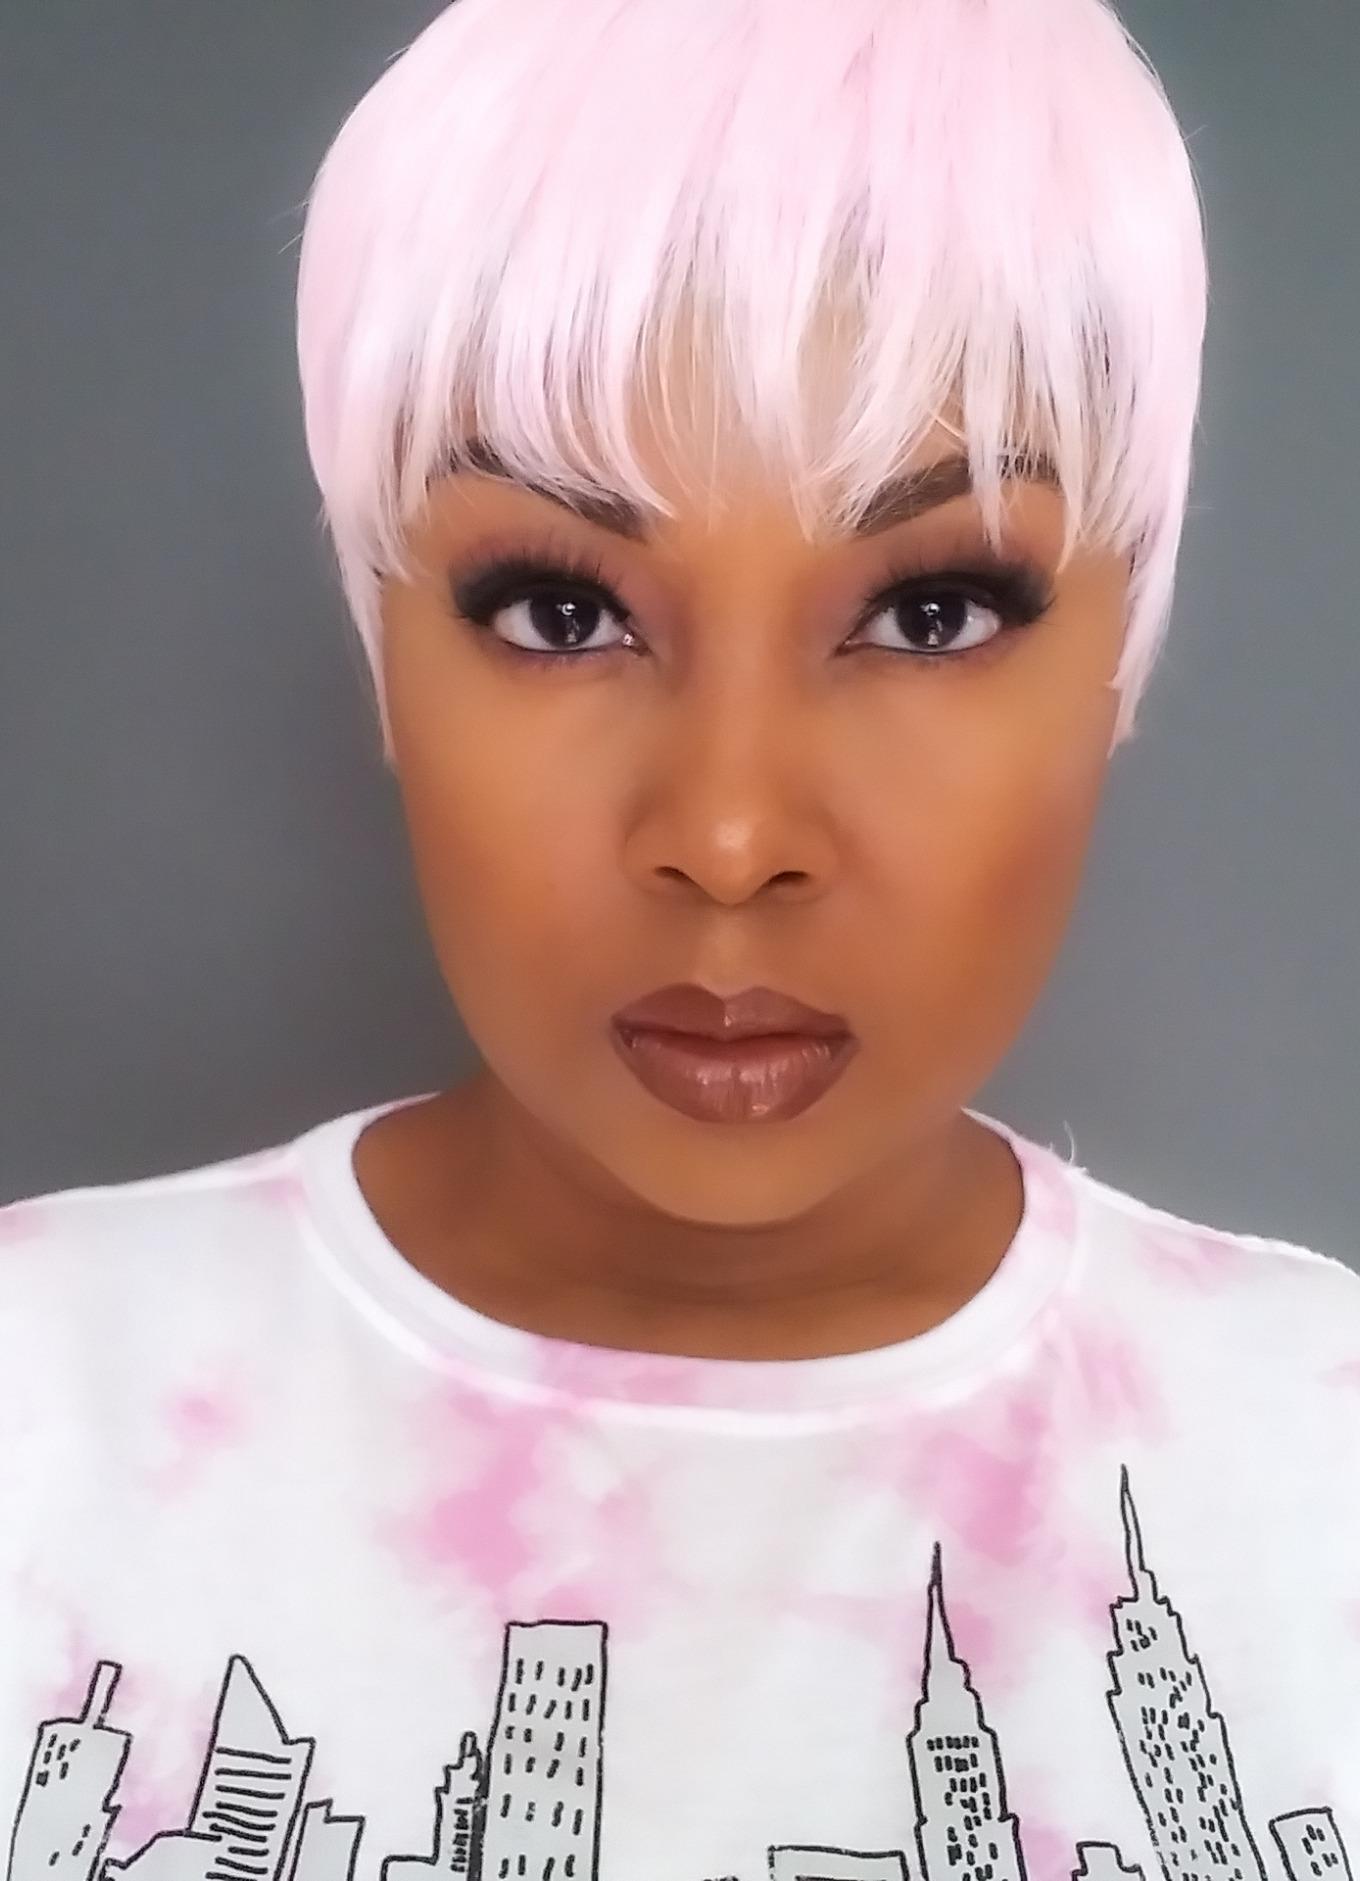 light skinned black woman wearing pink wig